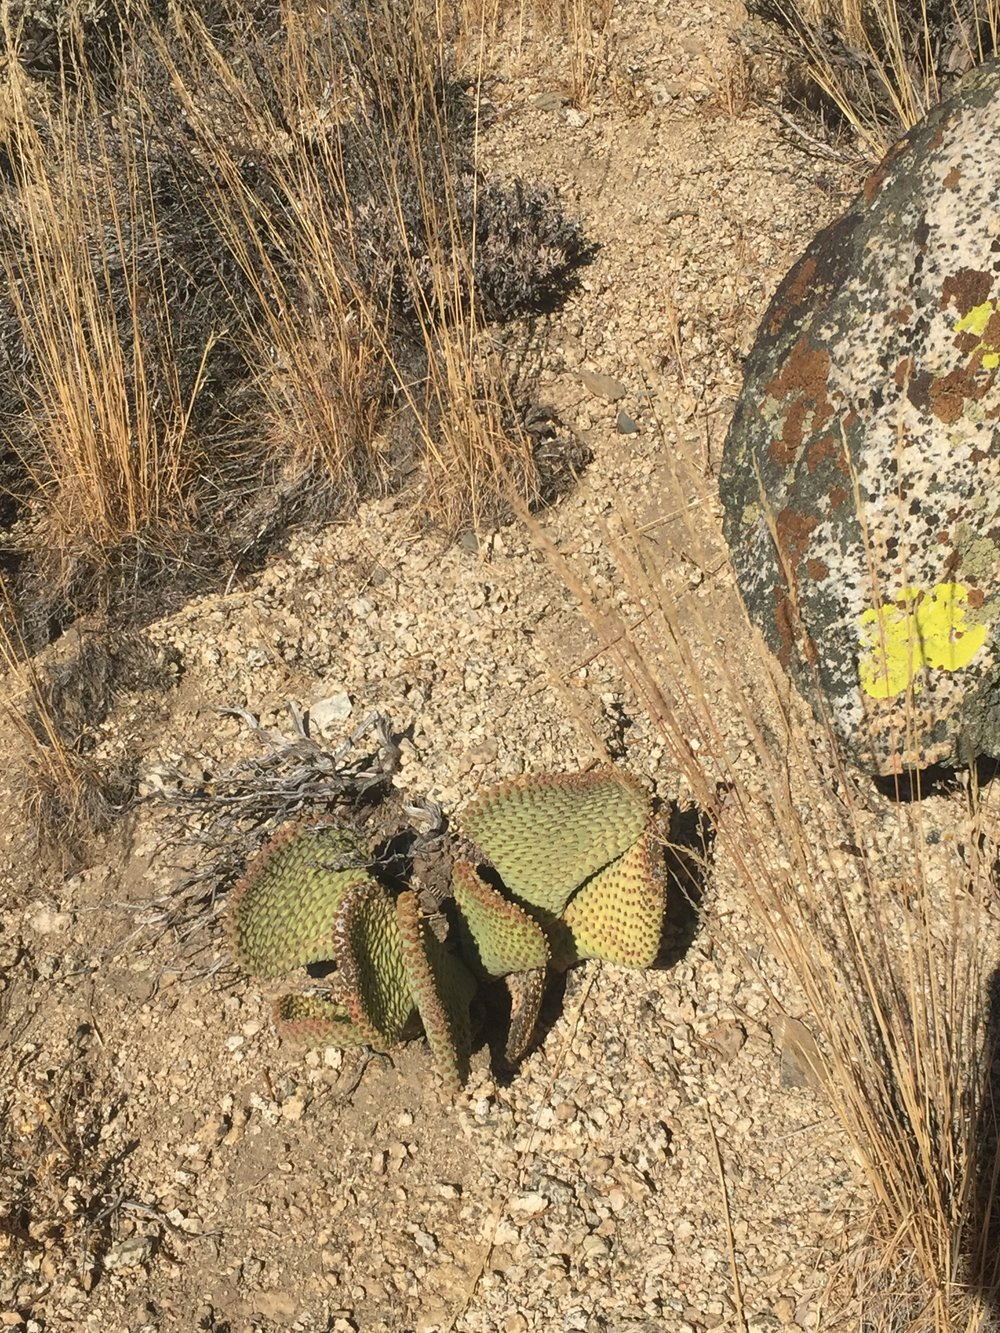 It's dry in the desert